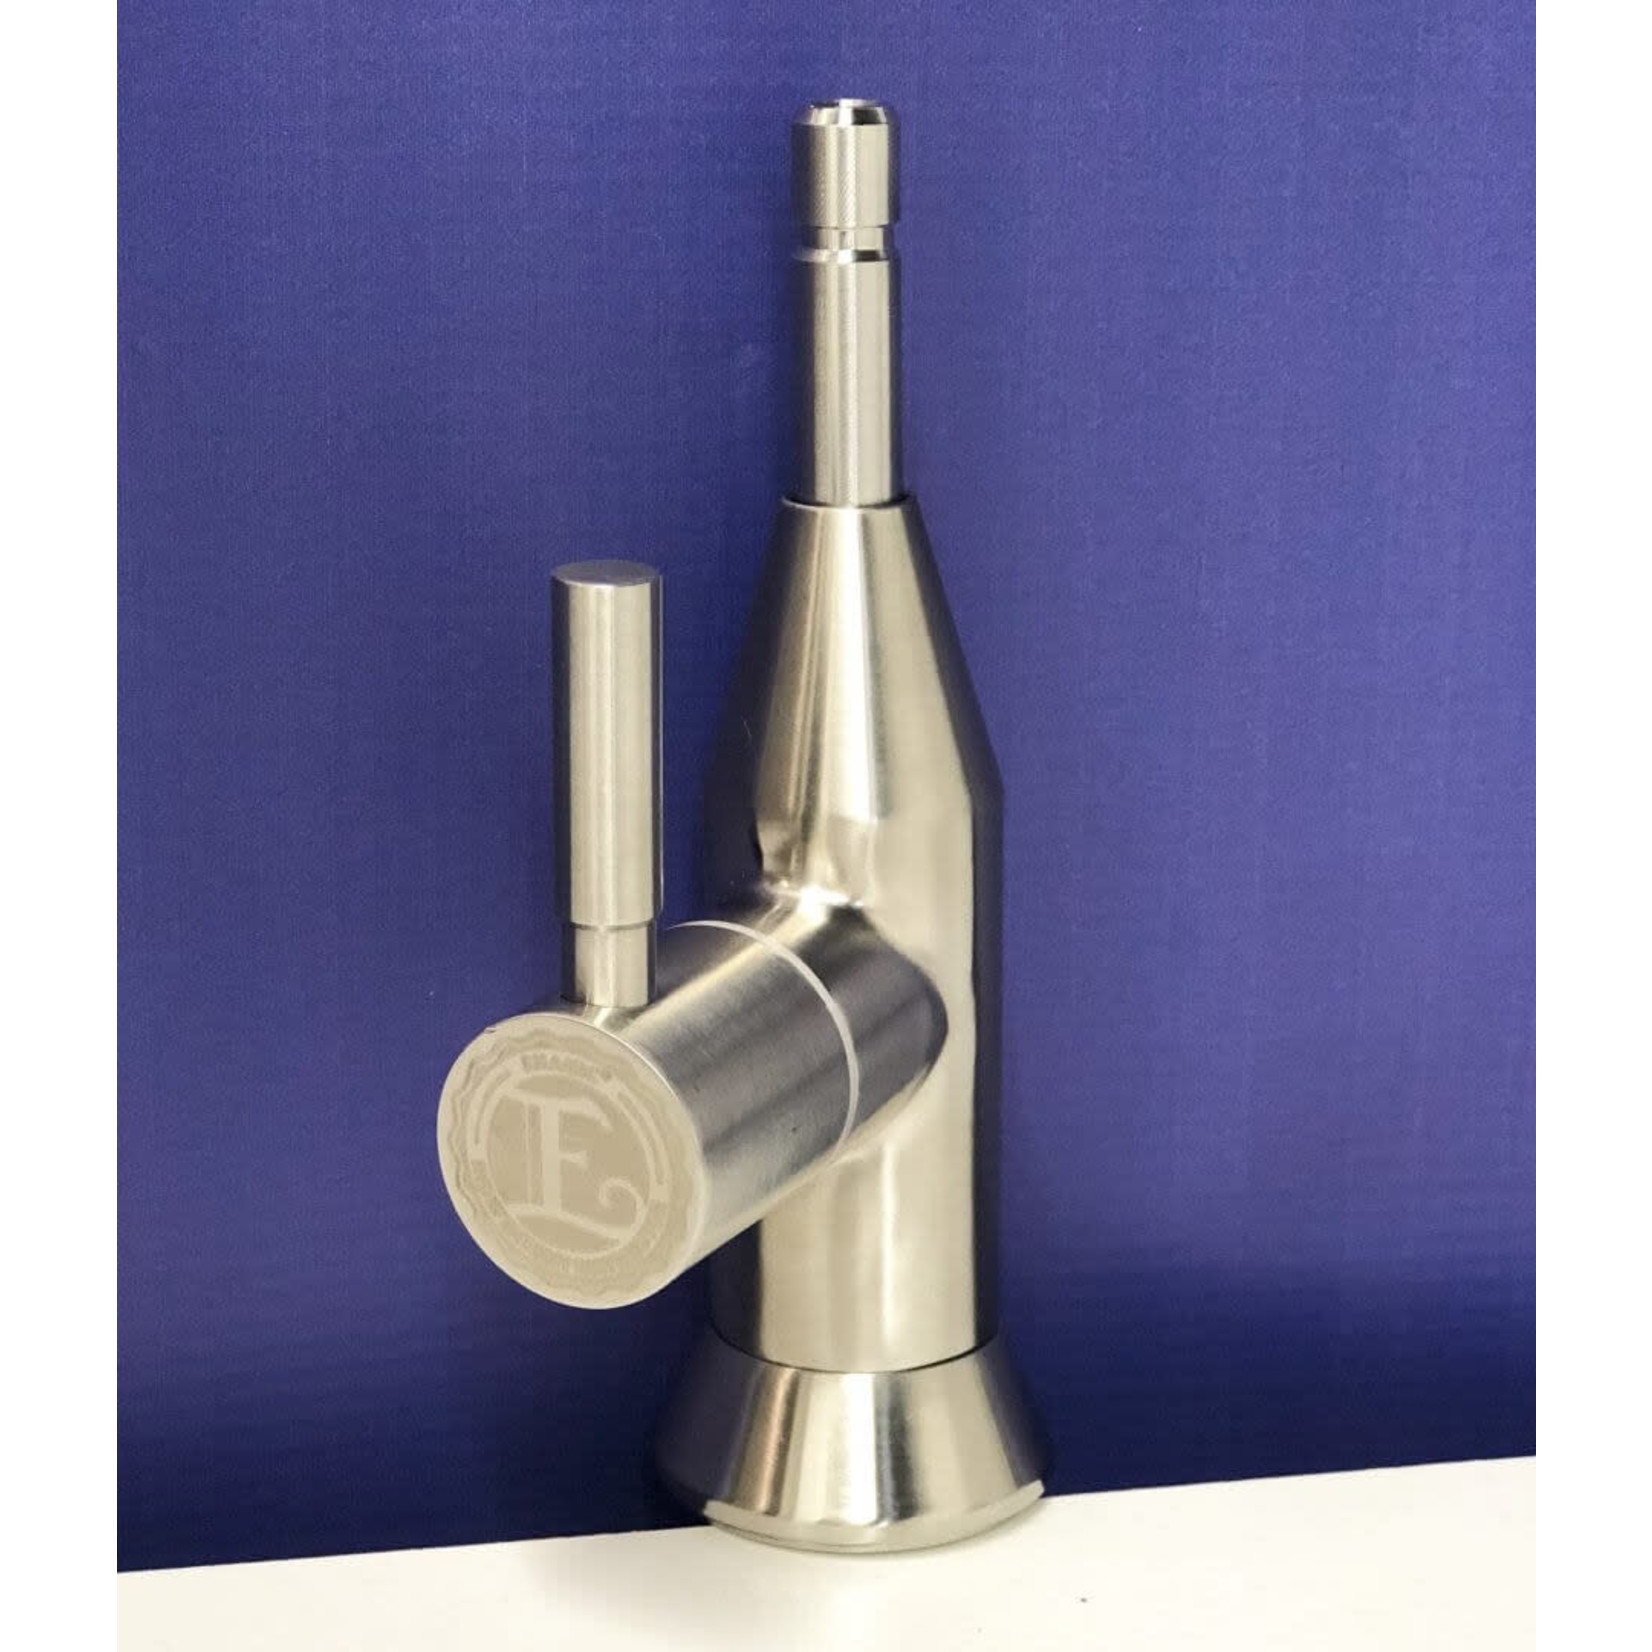 Enagic Enagic Faucet Kit Single